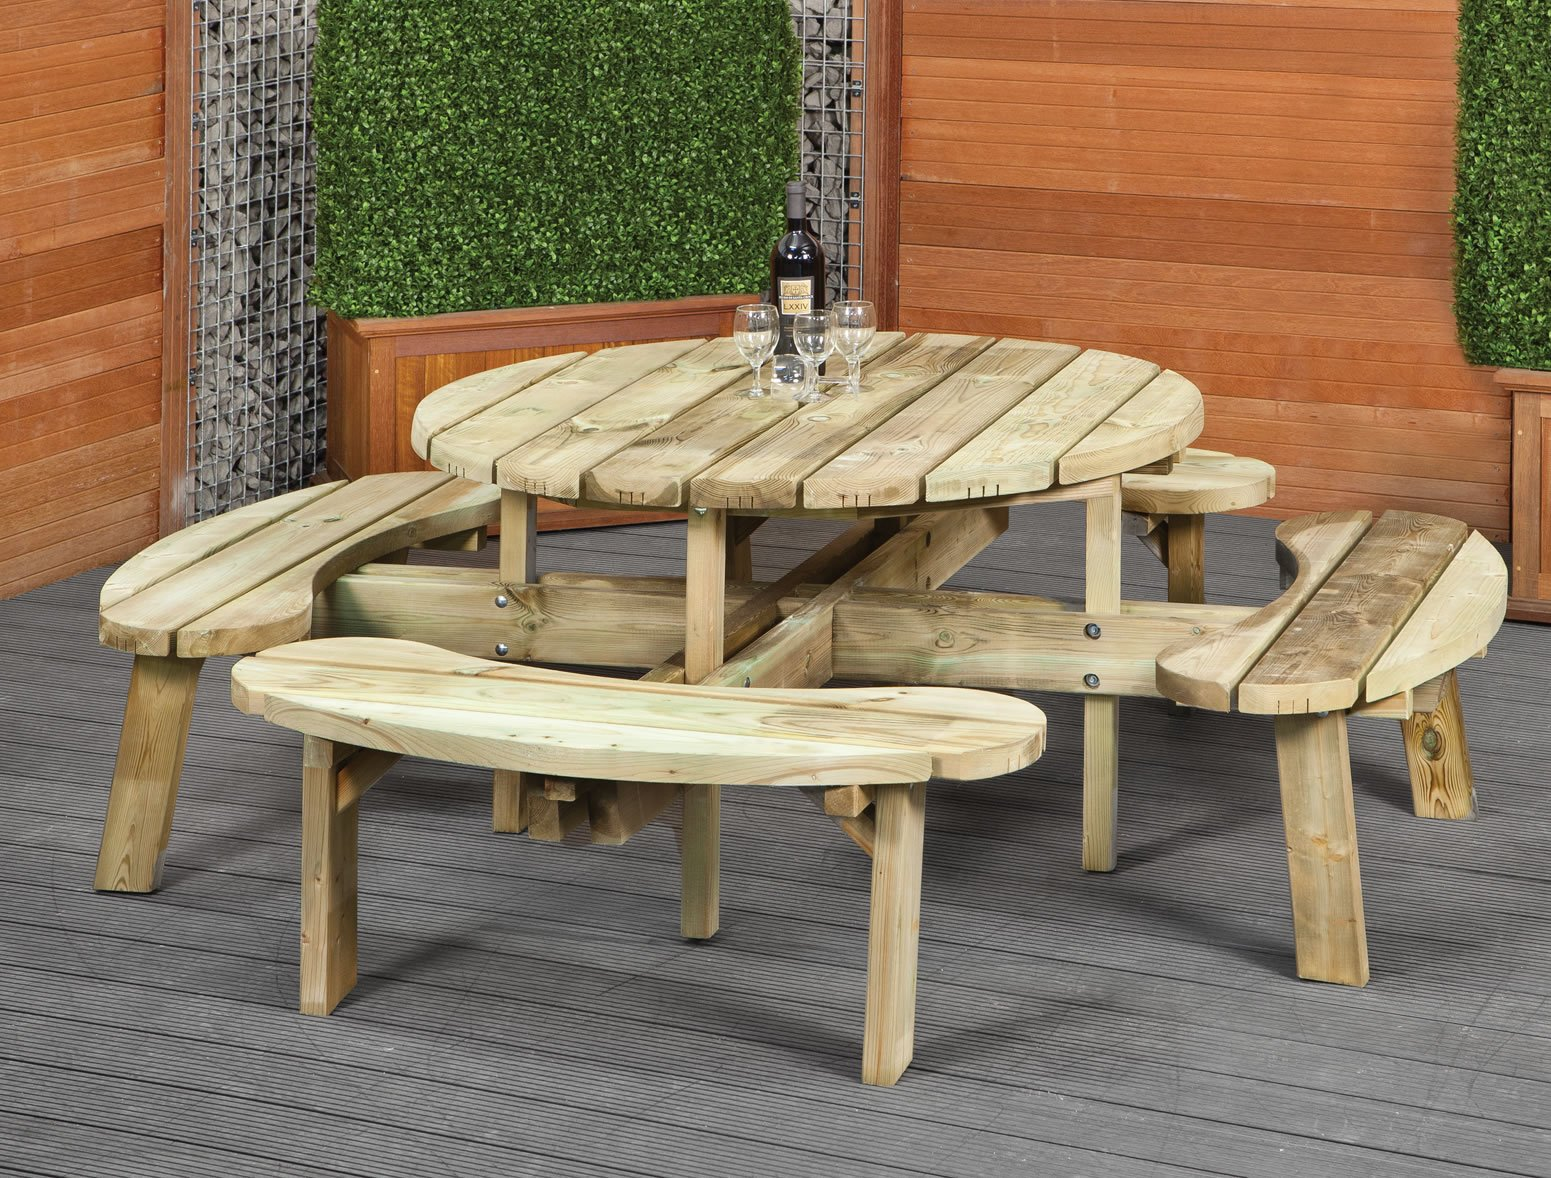 round picnic bench. Black Bedroom Furniture Sets. Home Design Ideas